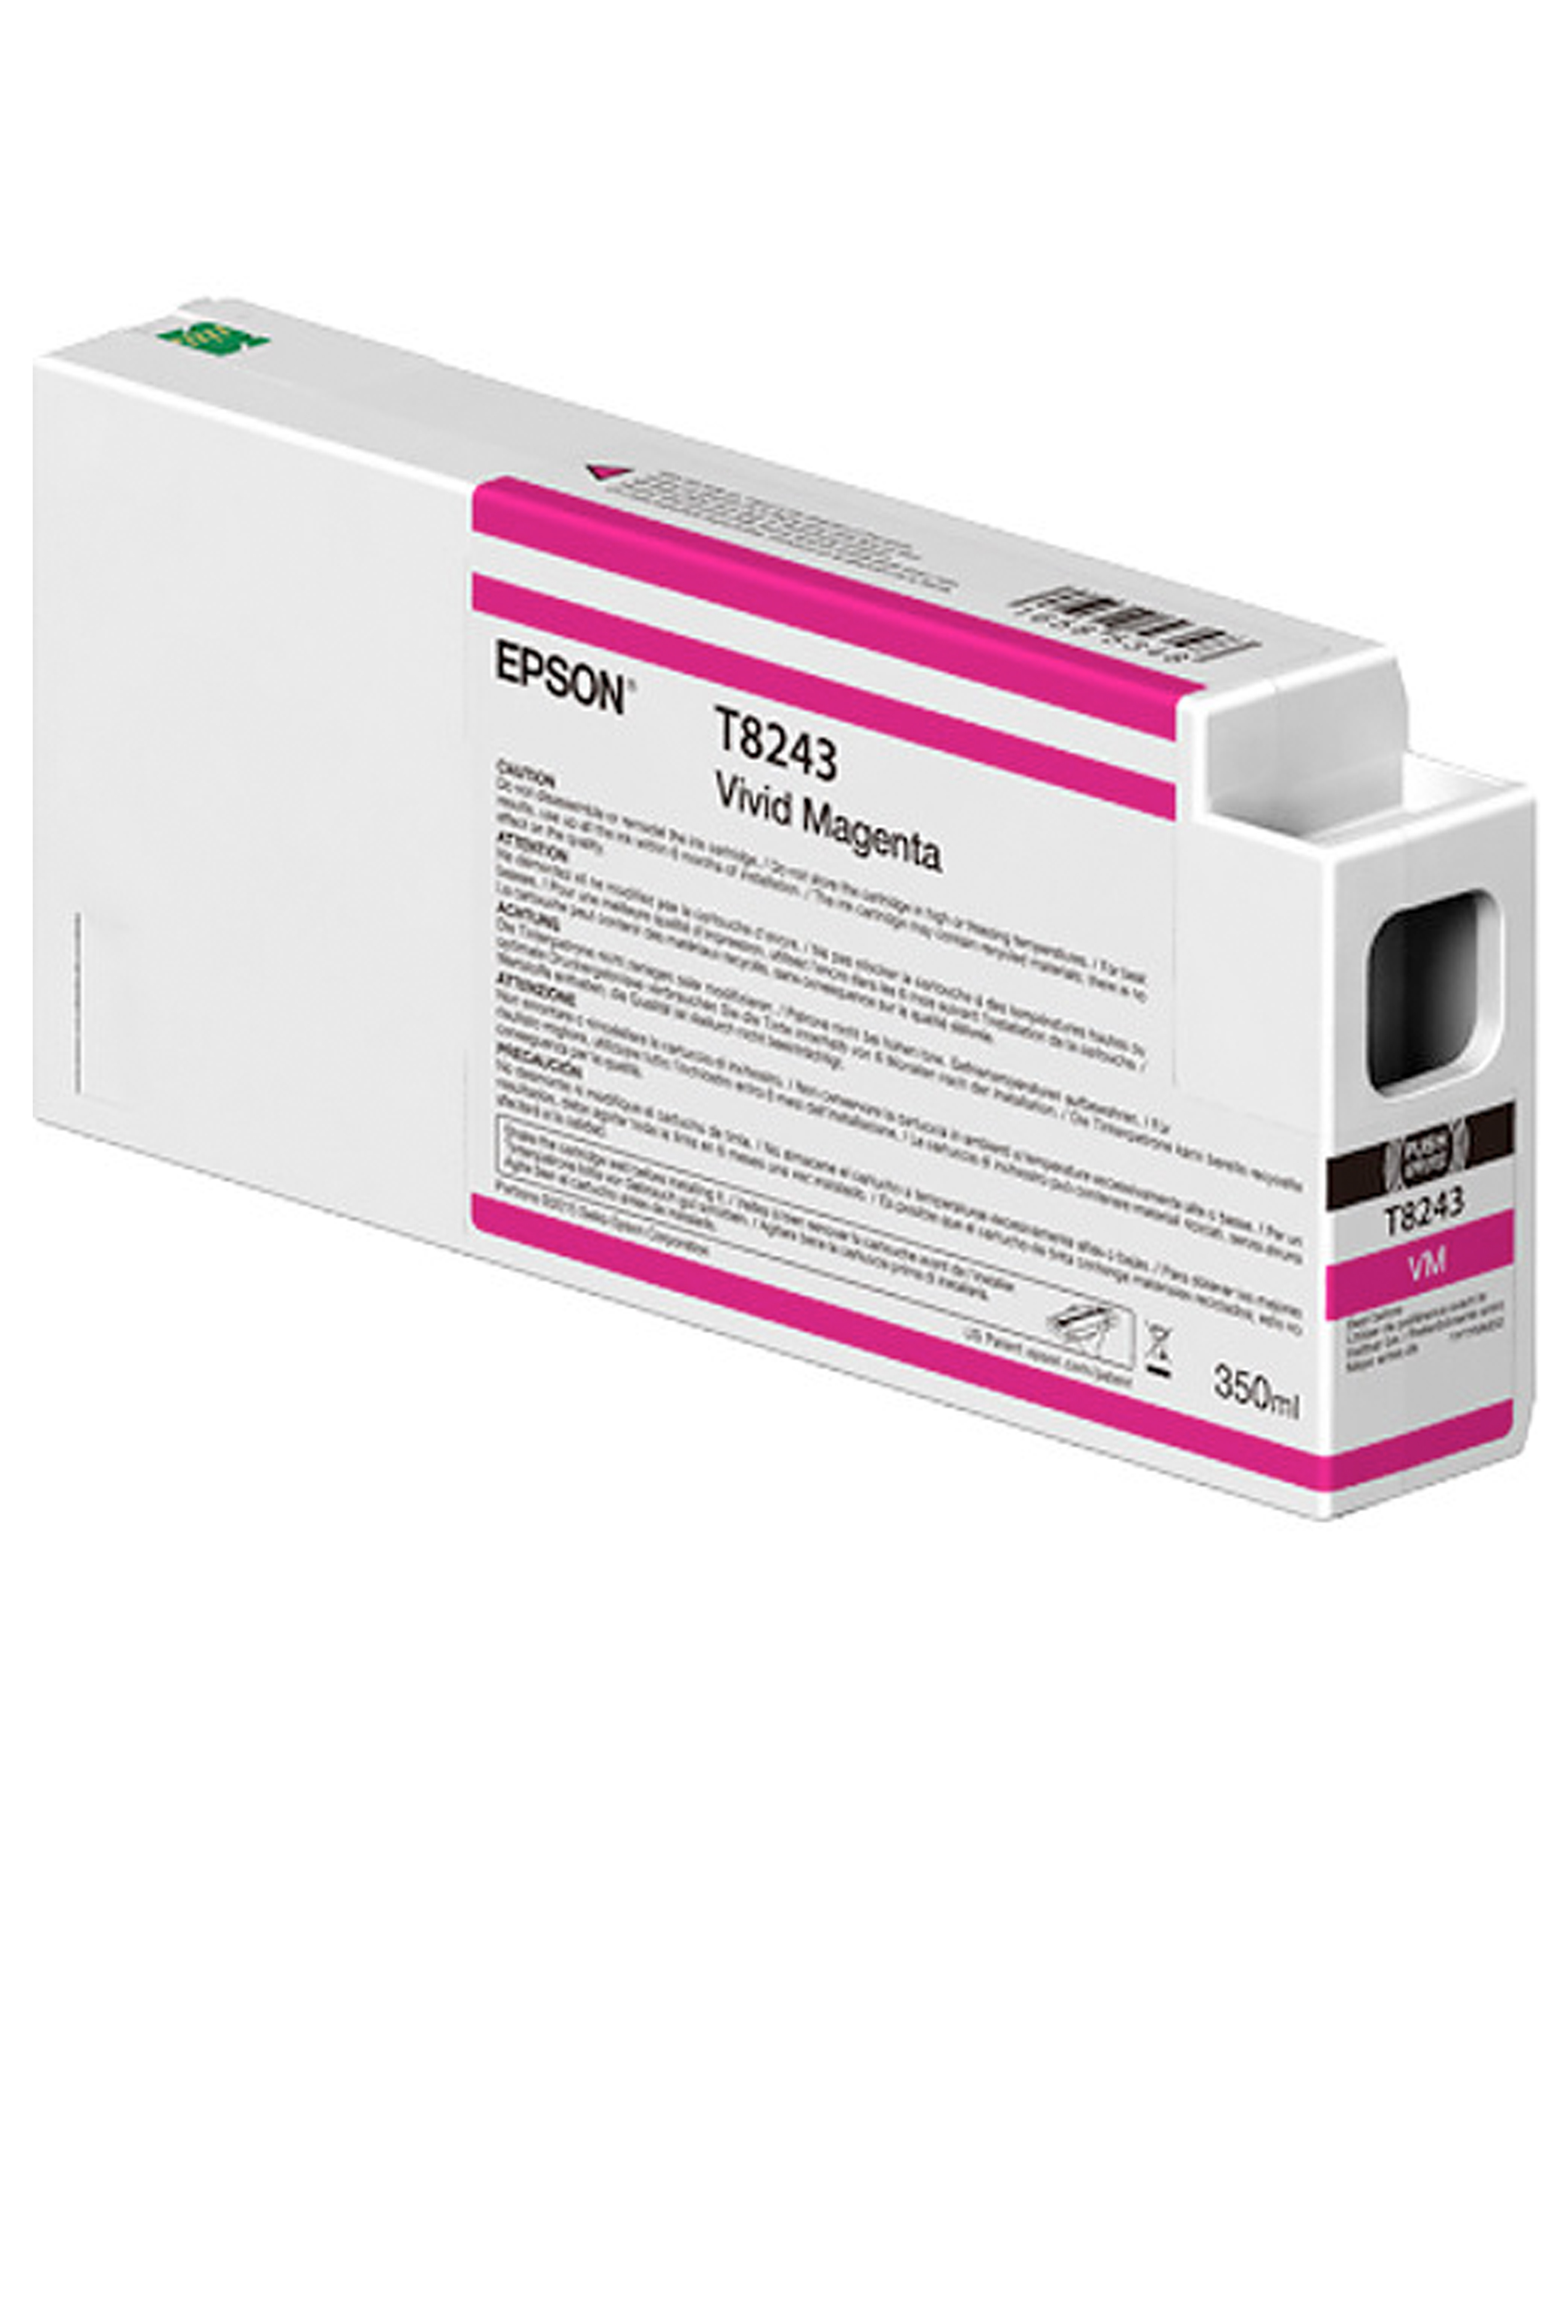 Epson EPSON HI MAGENTA INK (350 ML) (T824300)